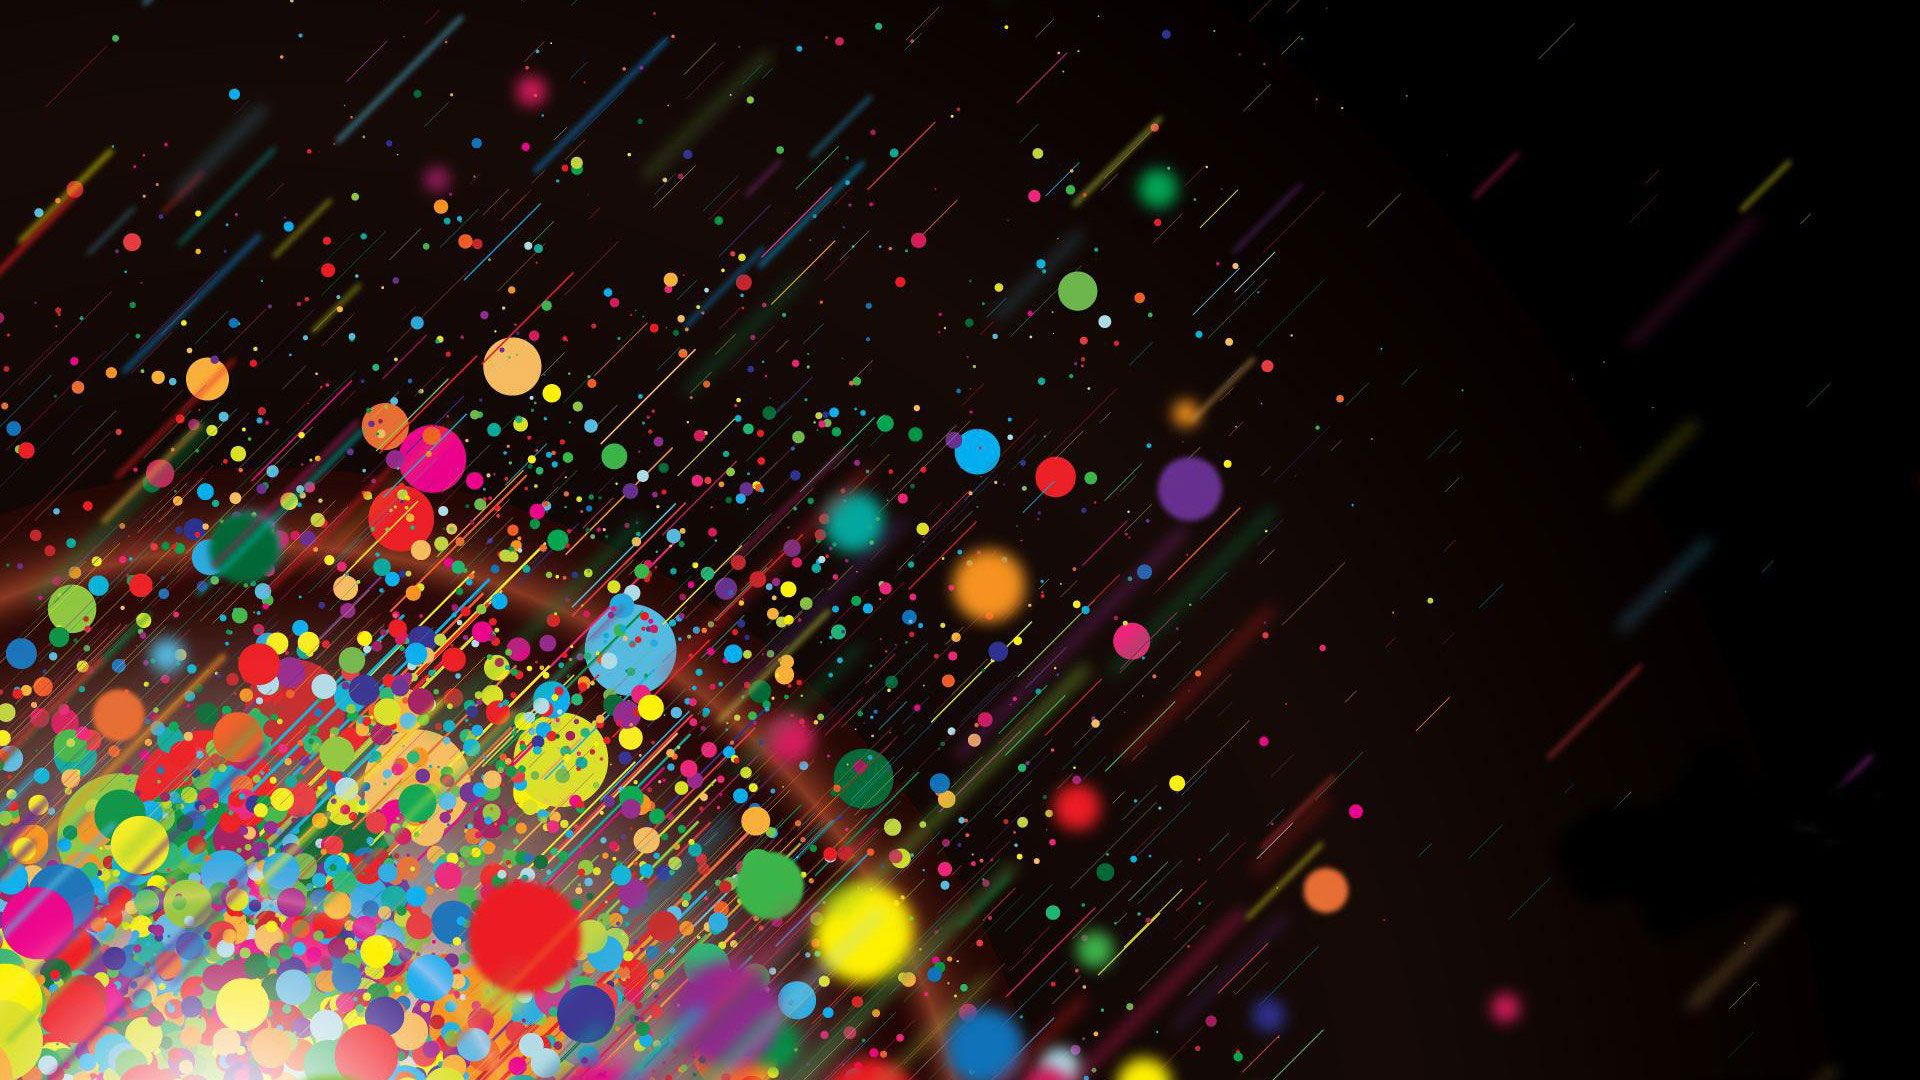 hd pics photos abstract colors rain desktop background wallpaper